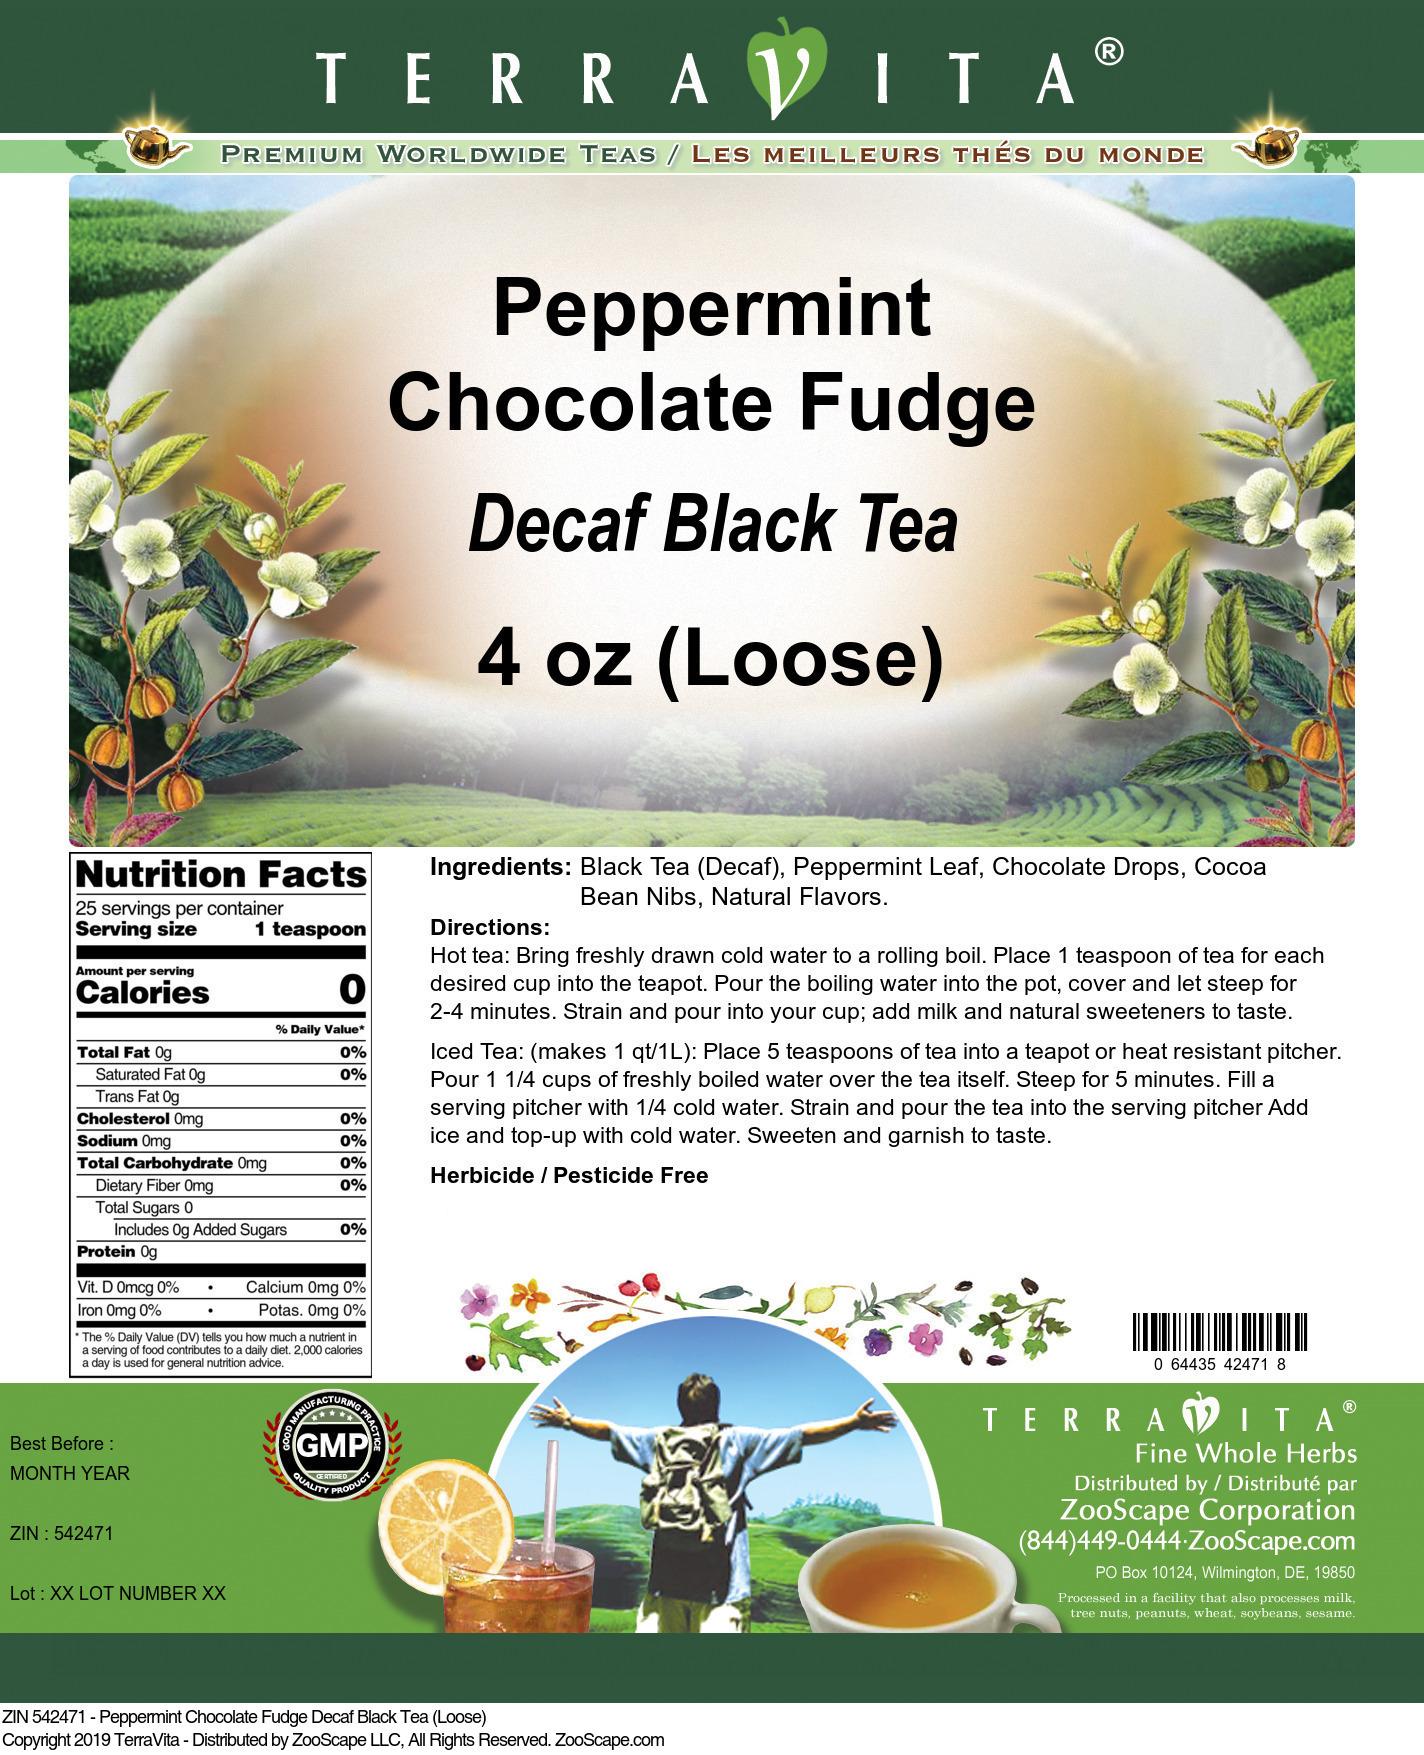 Peppermint Chocolate Fudge Decaf Black Tea (Loose)